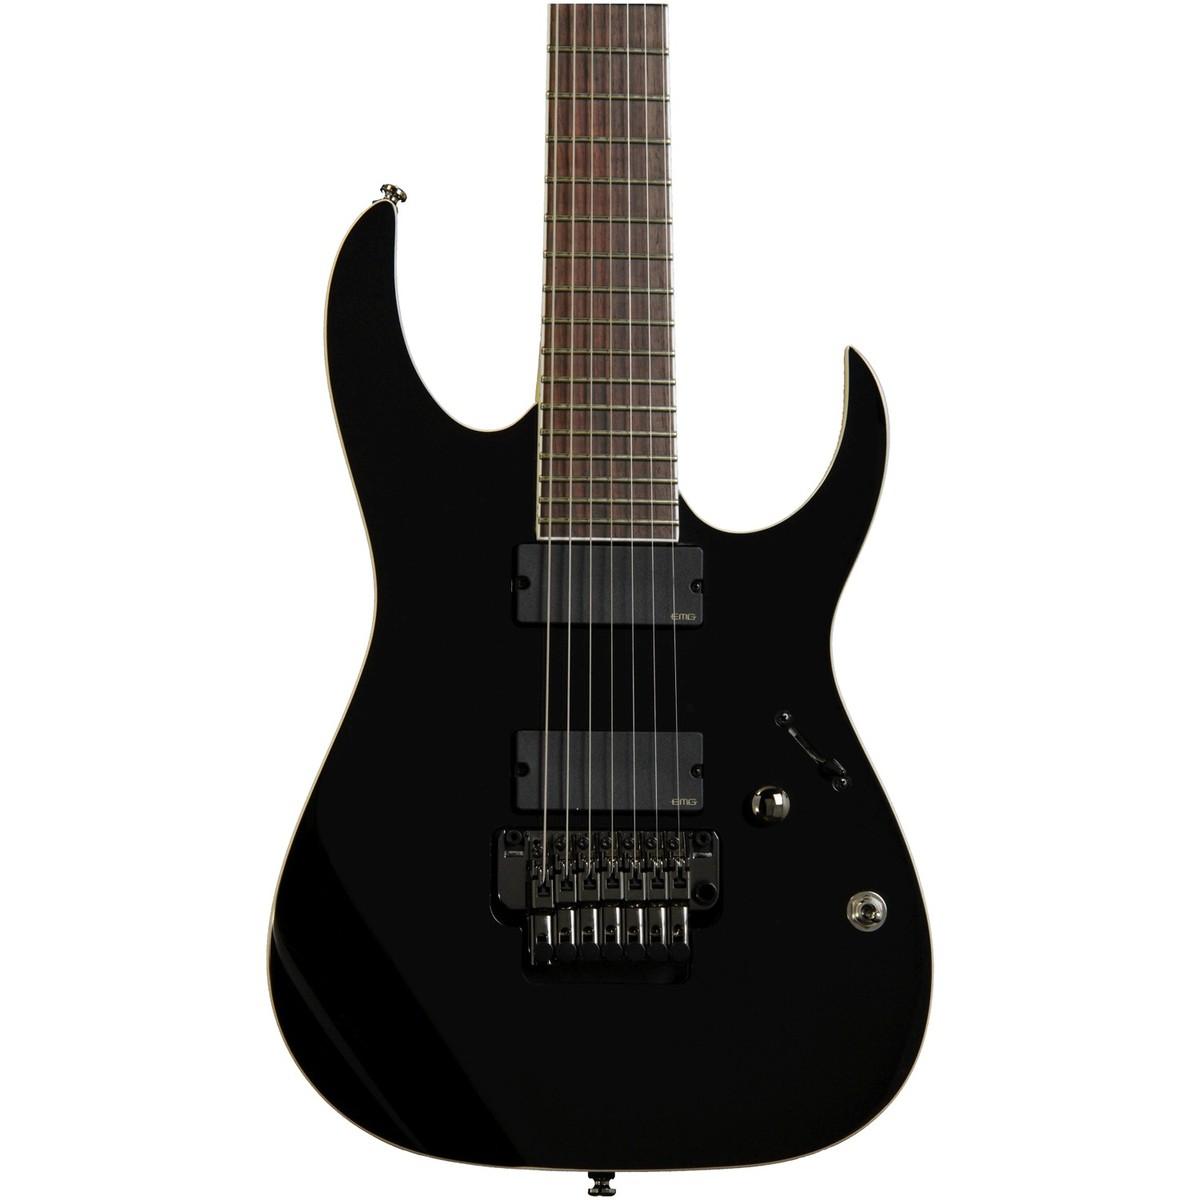 ibanez iron label rgir27e 7 string electric guitar black at. Black Bedroom Furniture Sets. Home Design Ideas